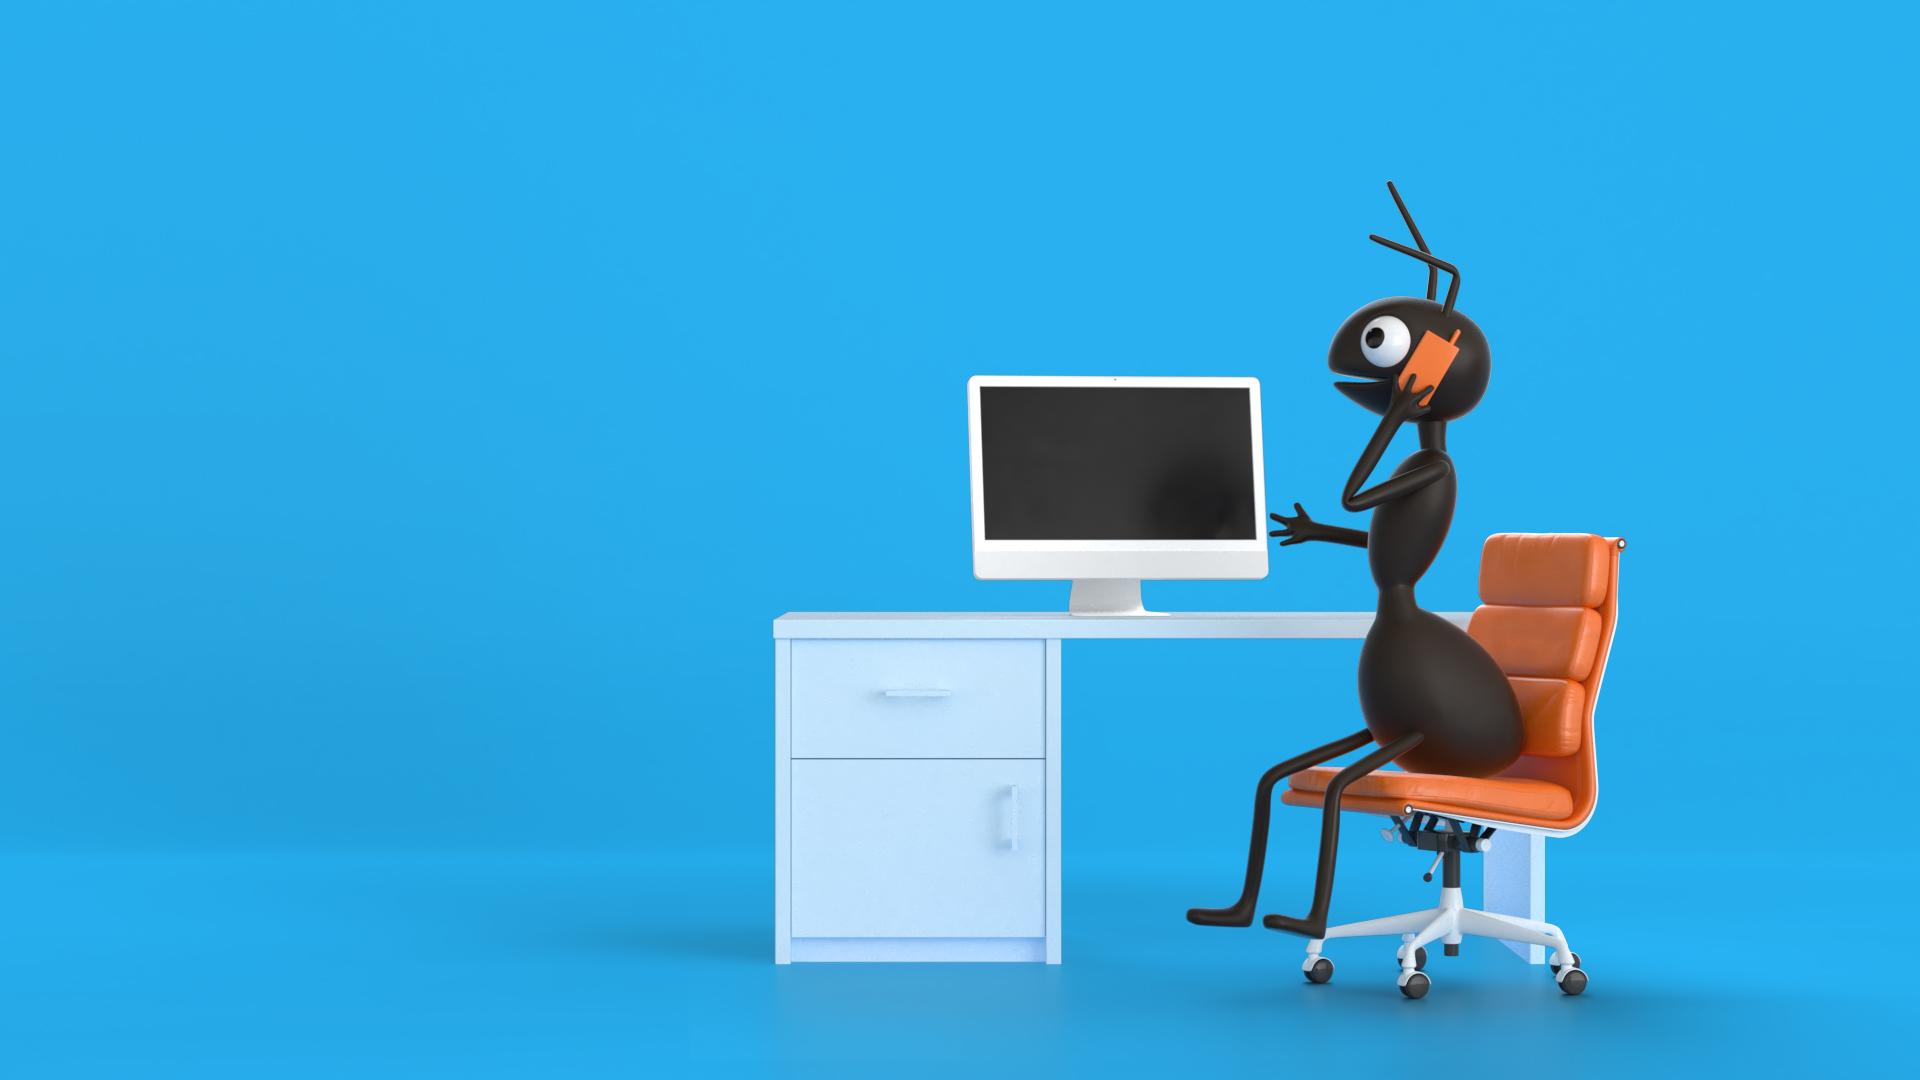 Active ants visual #01